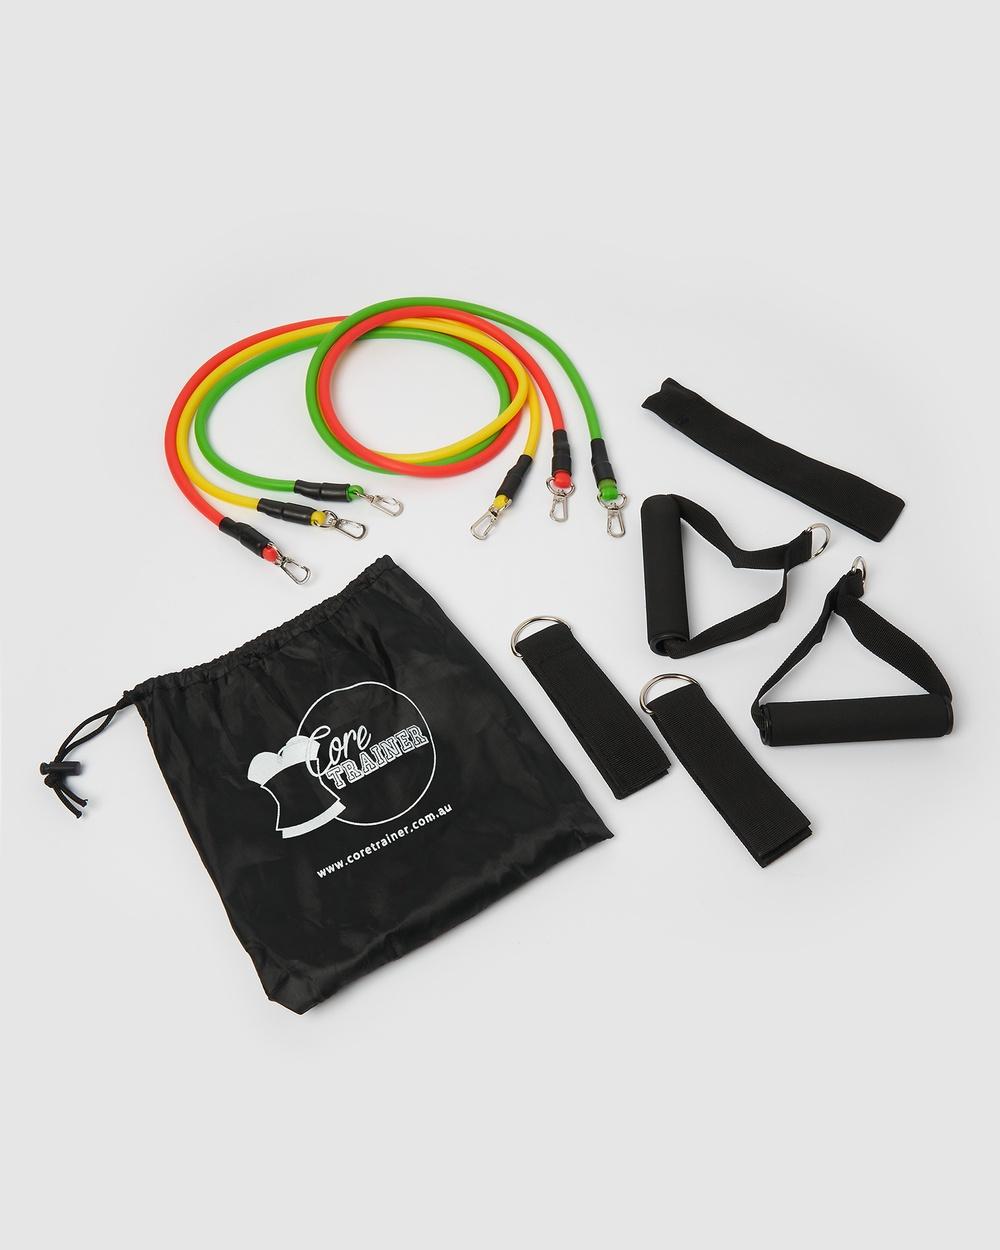 Core Trainer 3 Pack Resistance System Set Training Equipment Multi